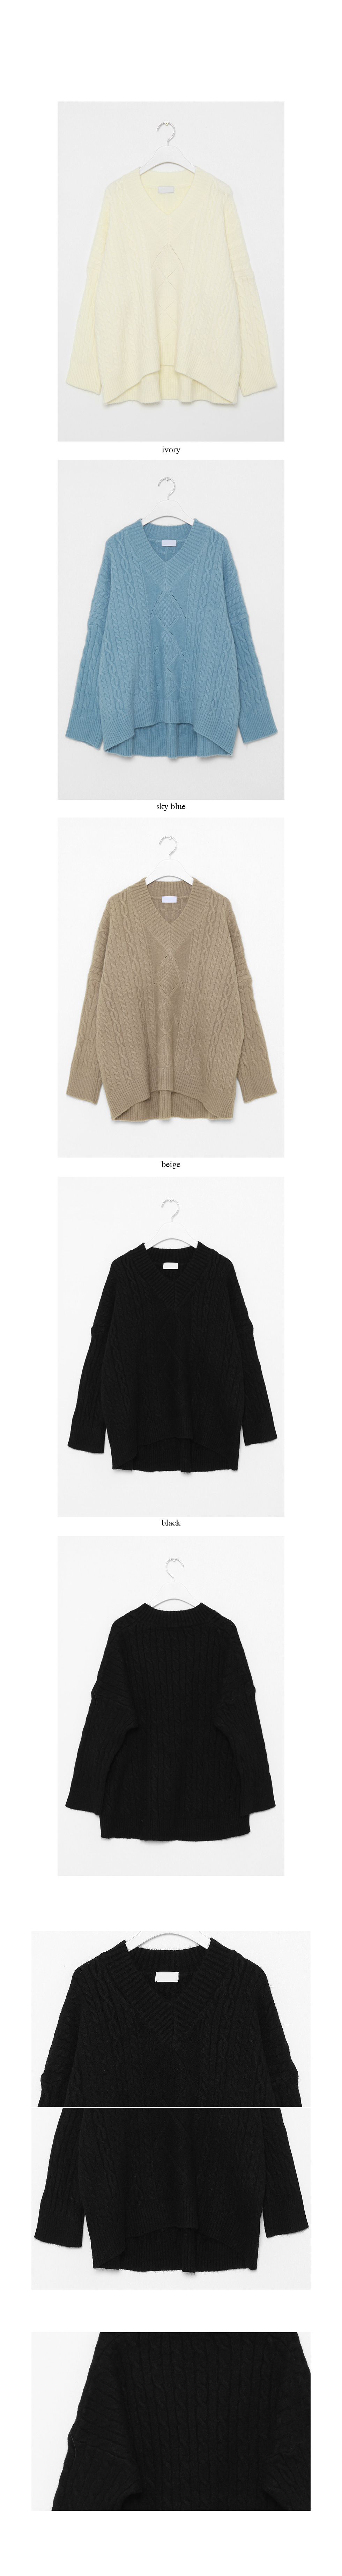 twist v-neck knit top